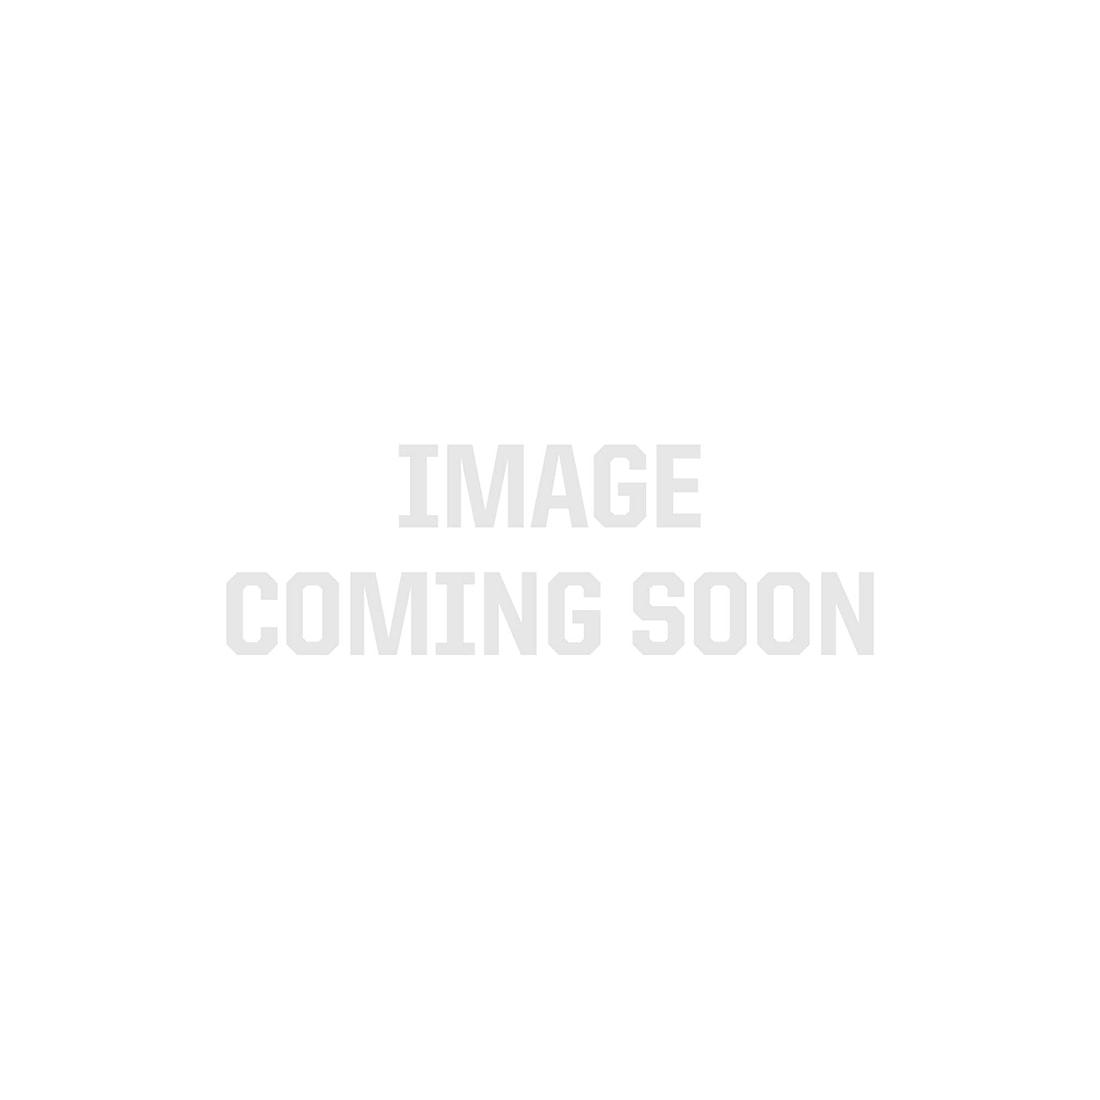 UltraSlim 2016 LED Strip Light - 4,000K - 120/m - Sample Kit